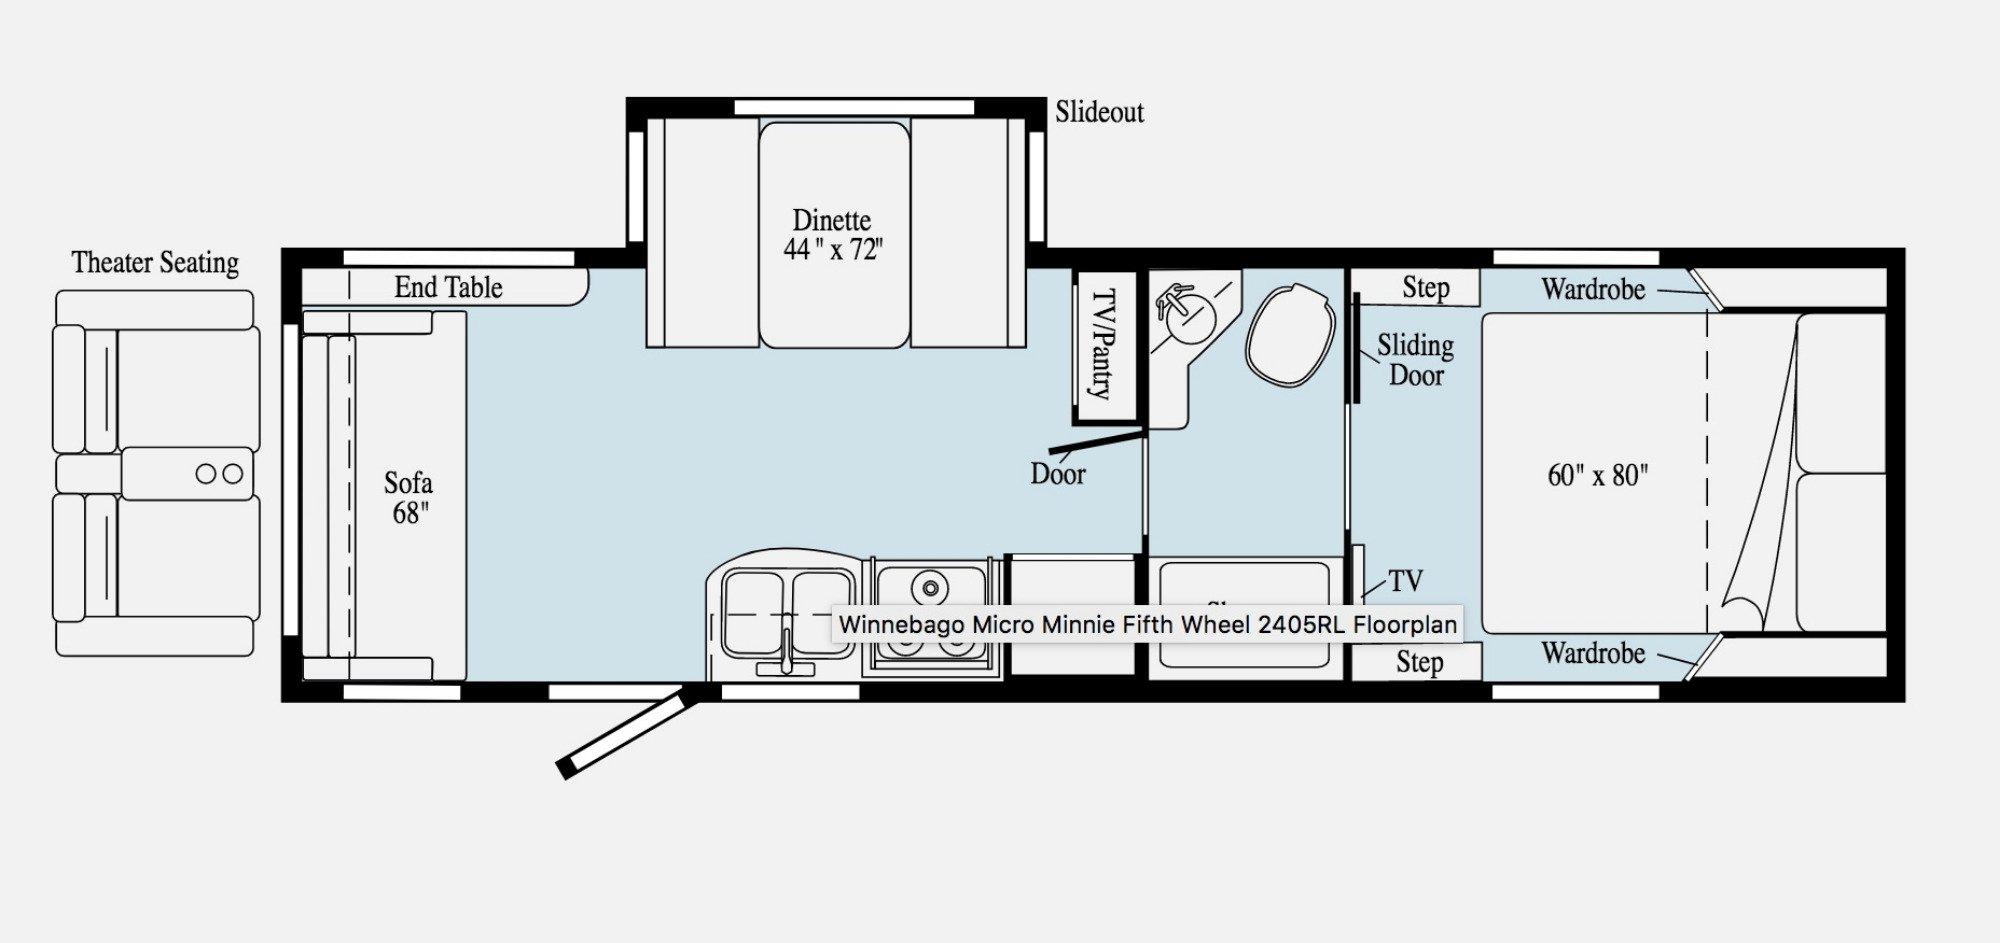 View Floor Plan for 2020 WINNEBAGO MICRO MINNIE 2405RL